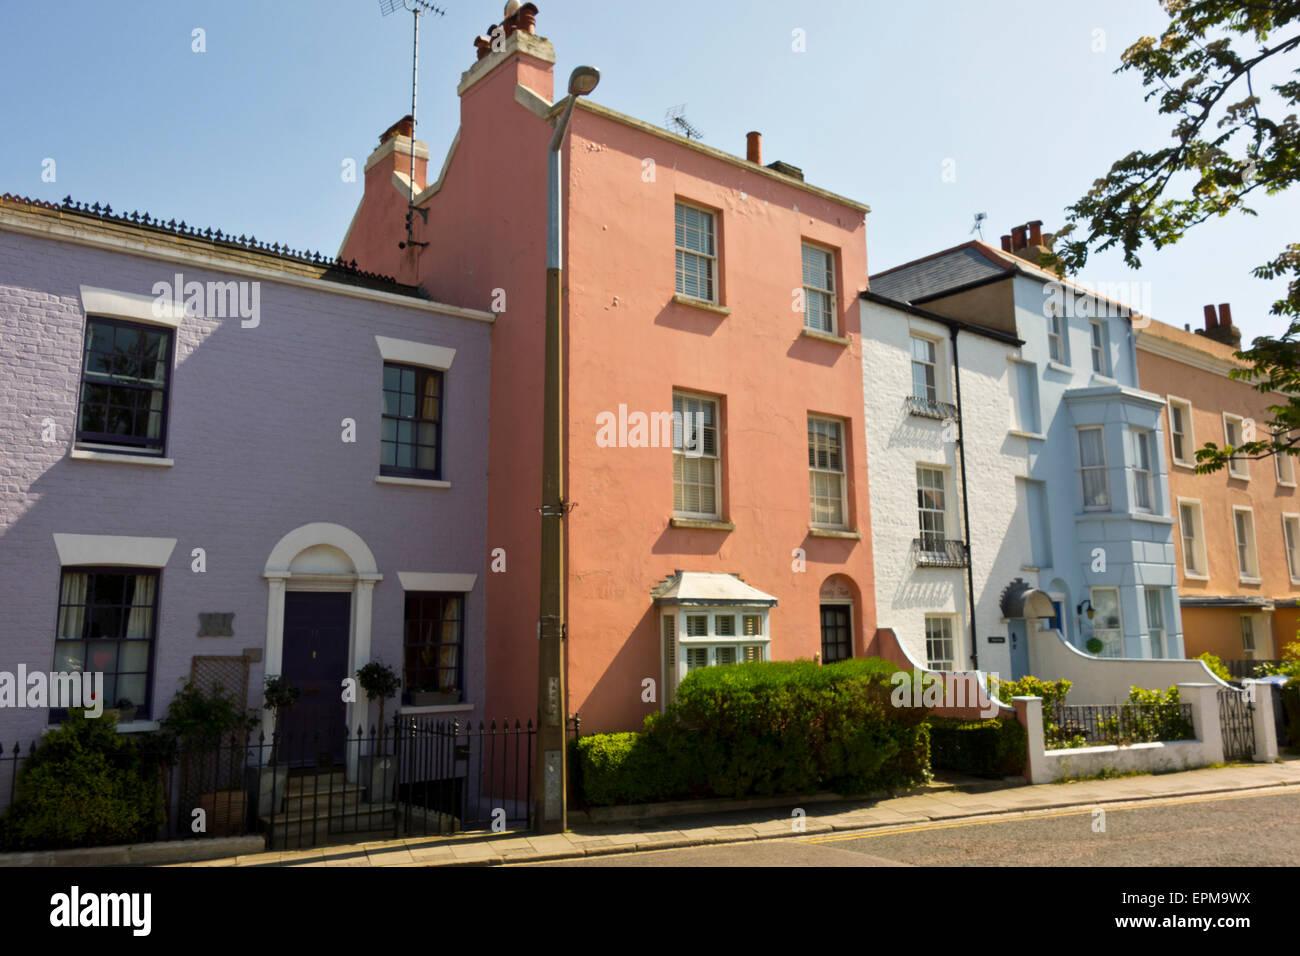 colourful houses street Broadstairs Kent England UK - Stock Image